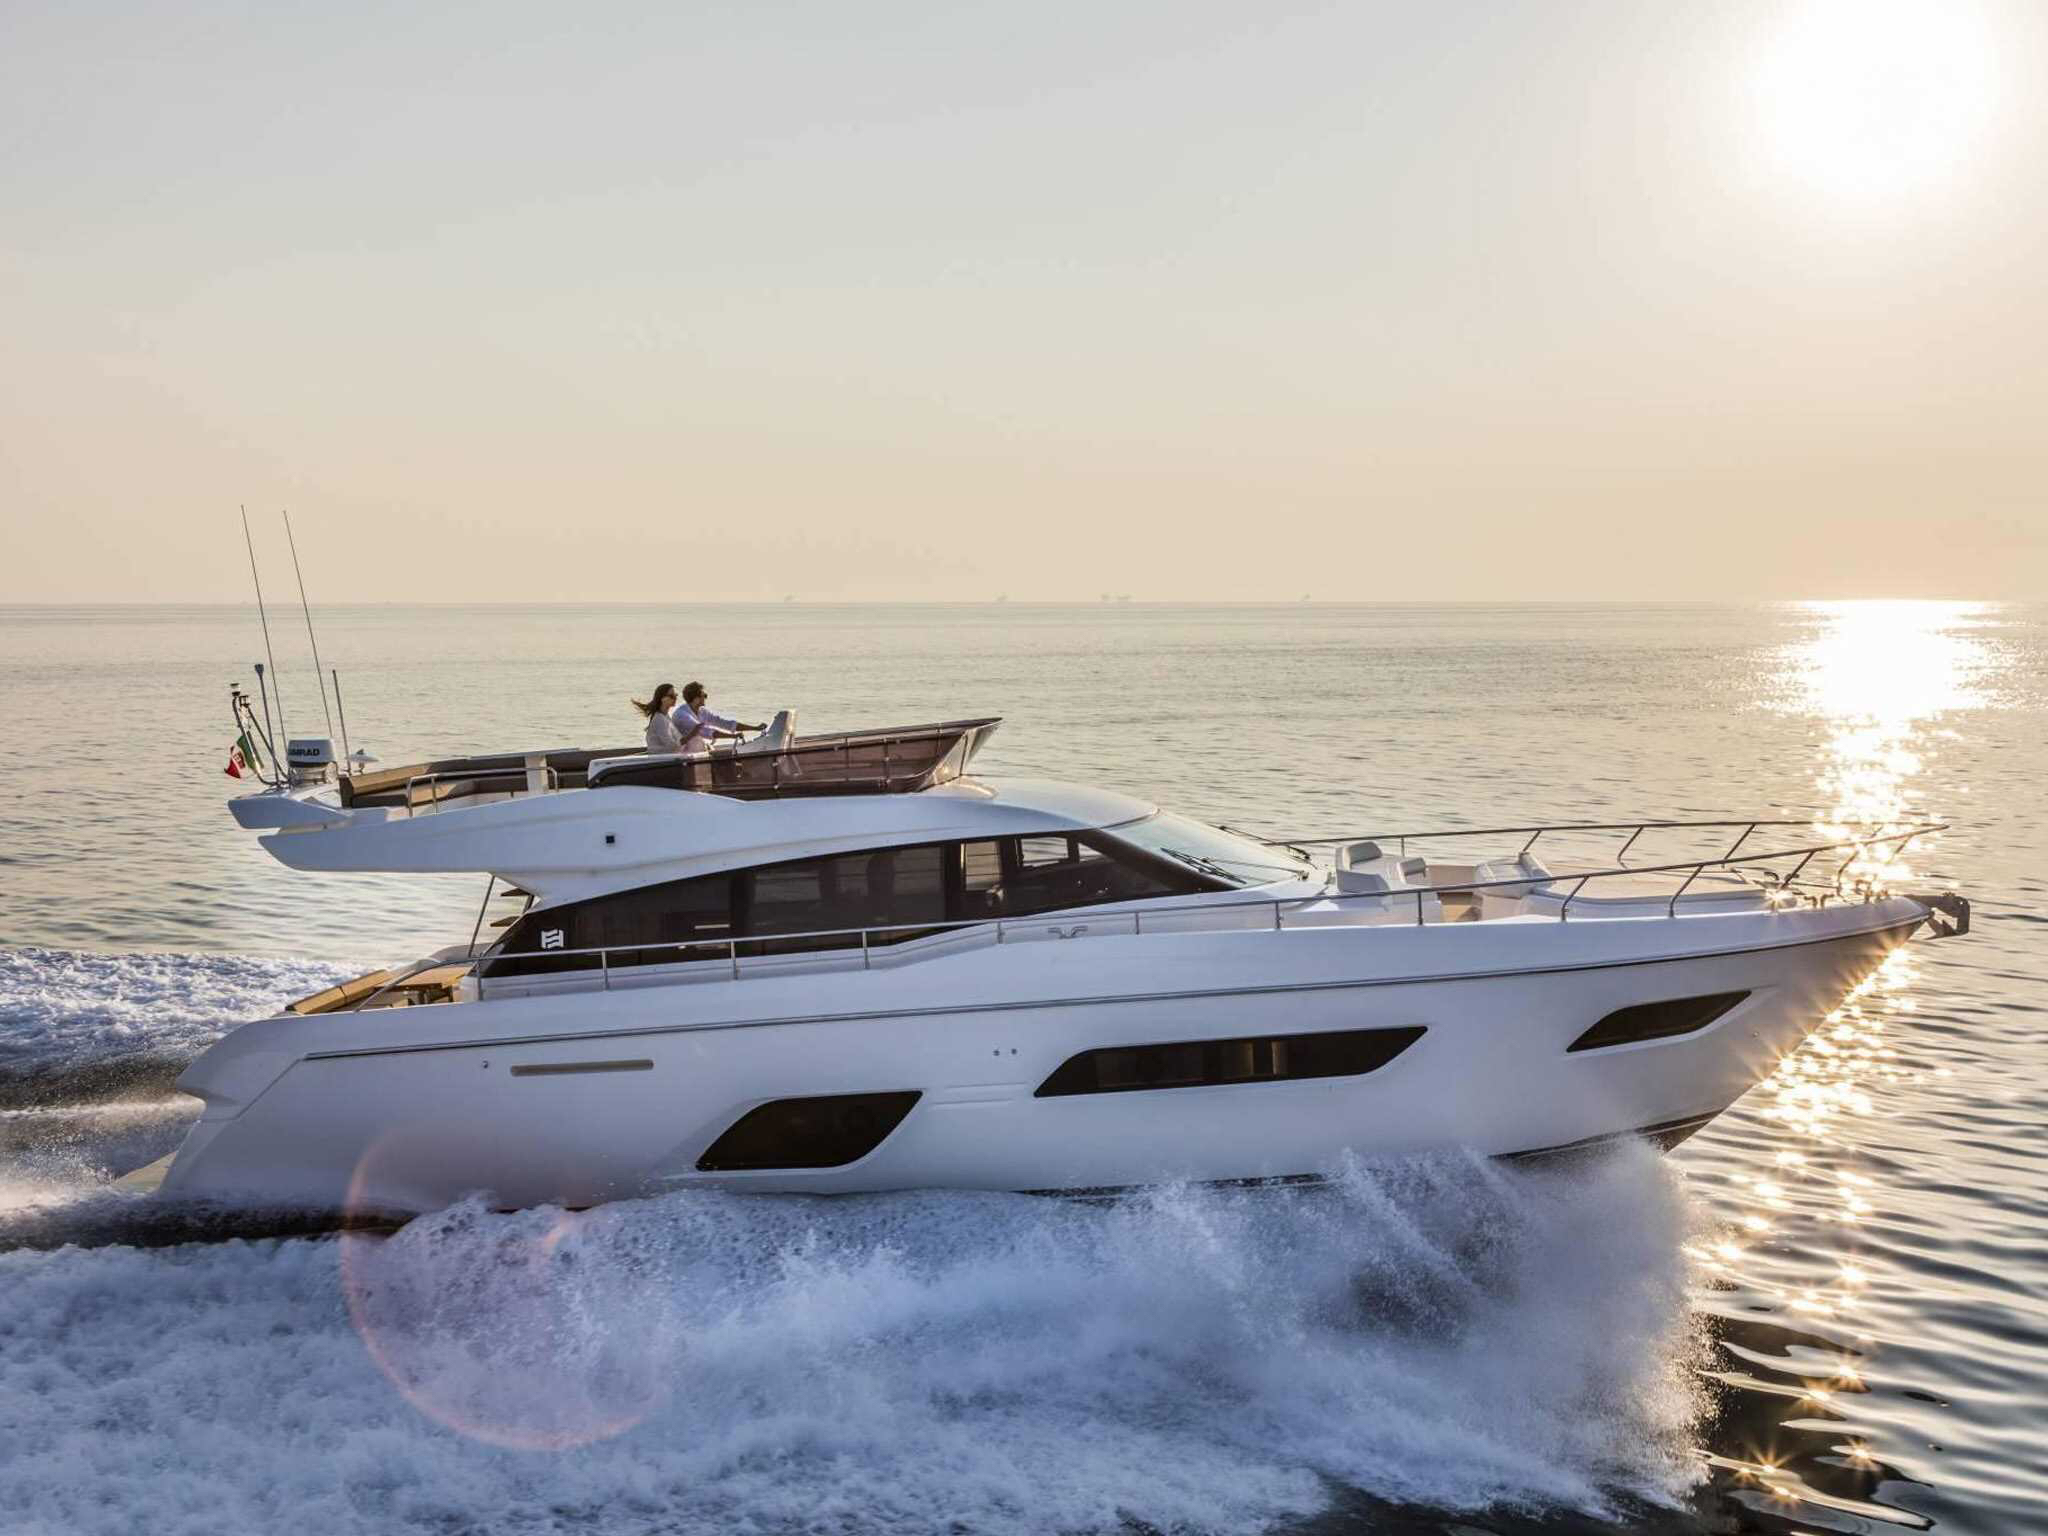 ferretti yachts 550 ferretti group JMA Yachting Port Fréjus Var vente location neuf occasion places de port